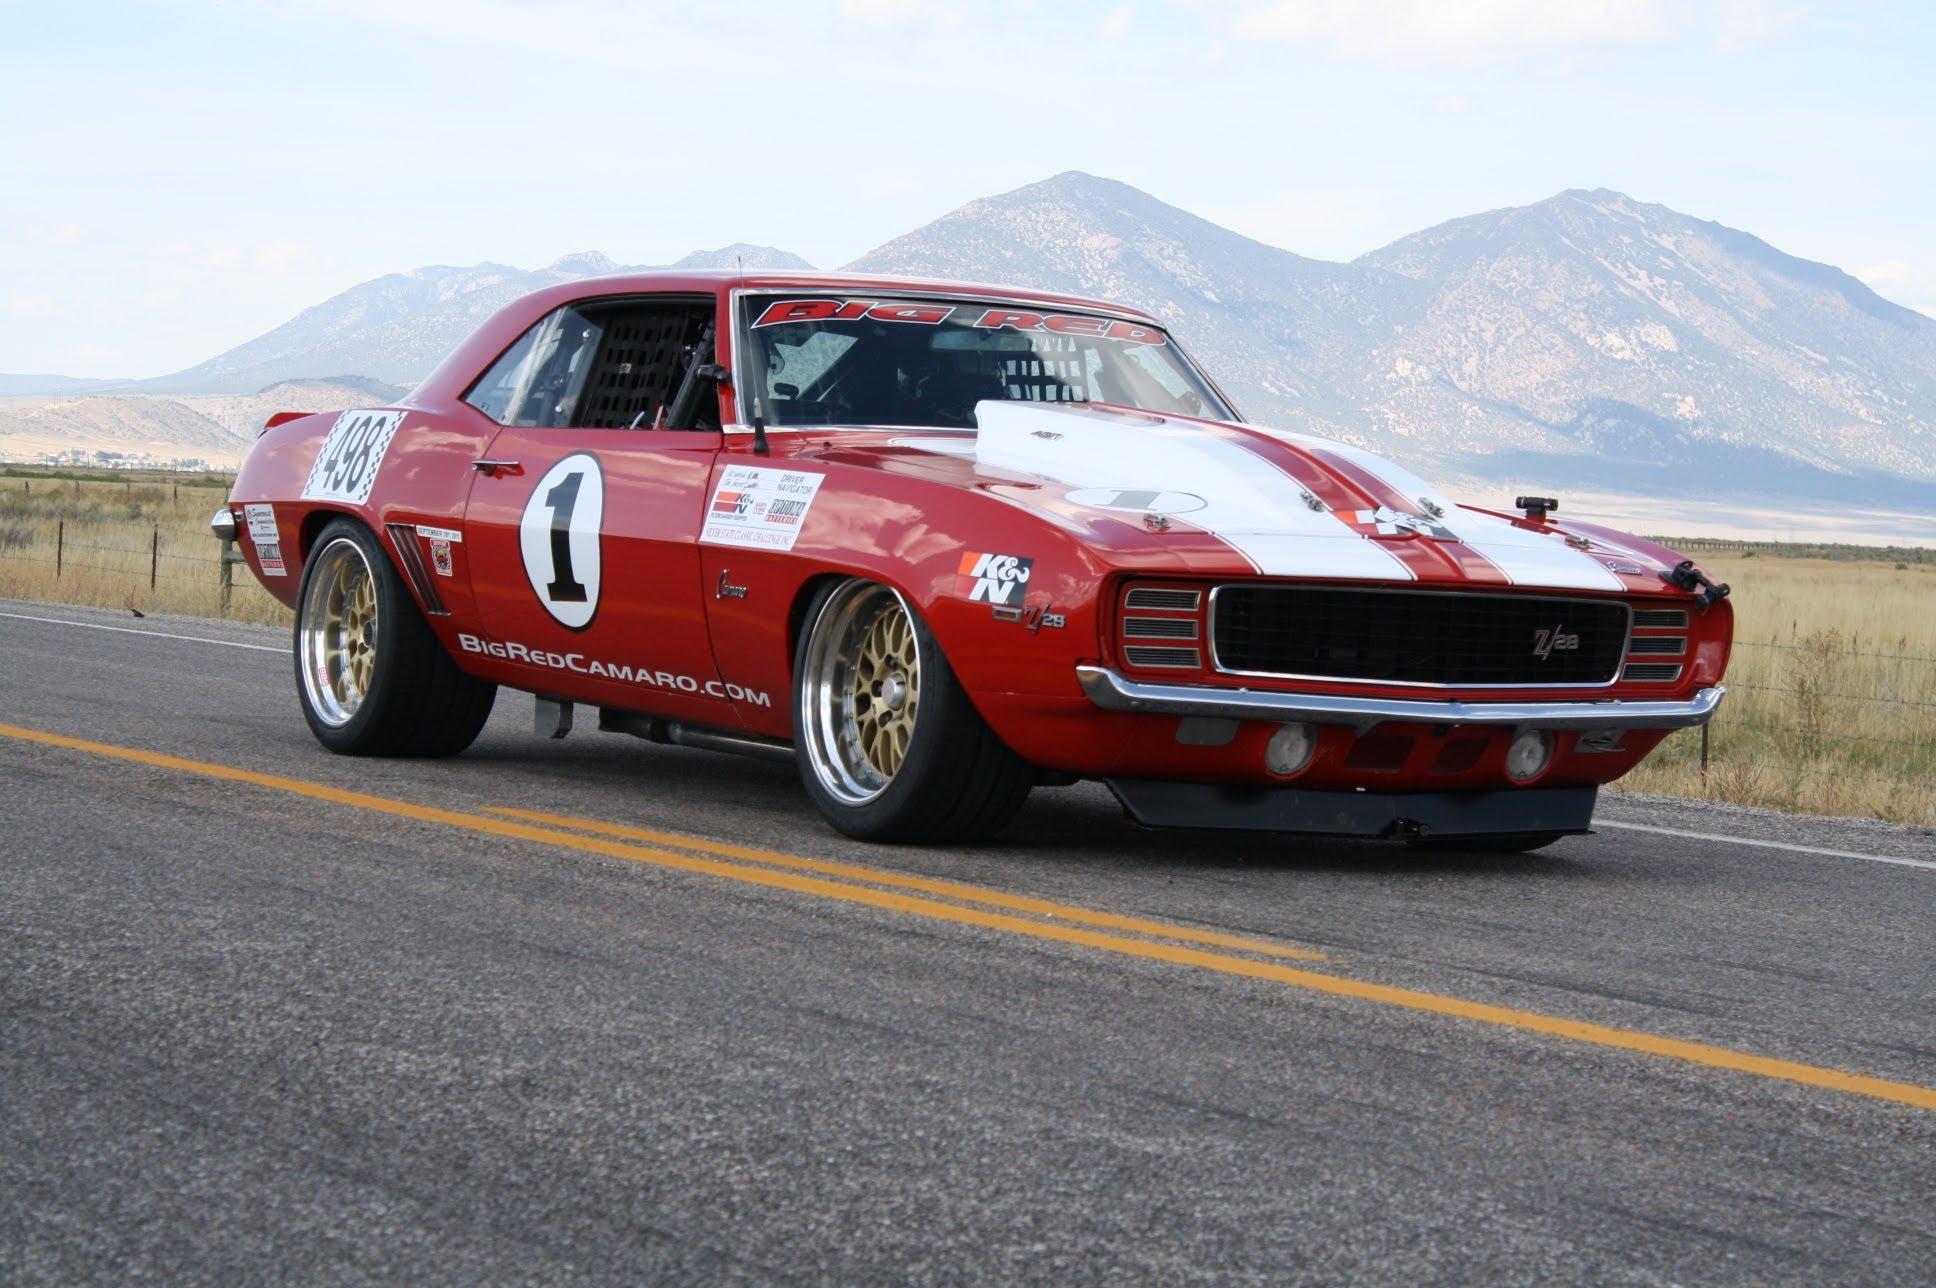 Big Red 1969 Camaro: A Classic Muscle Car